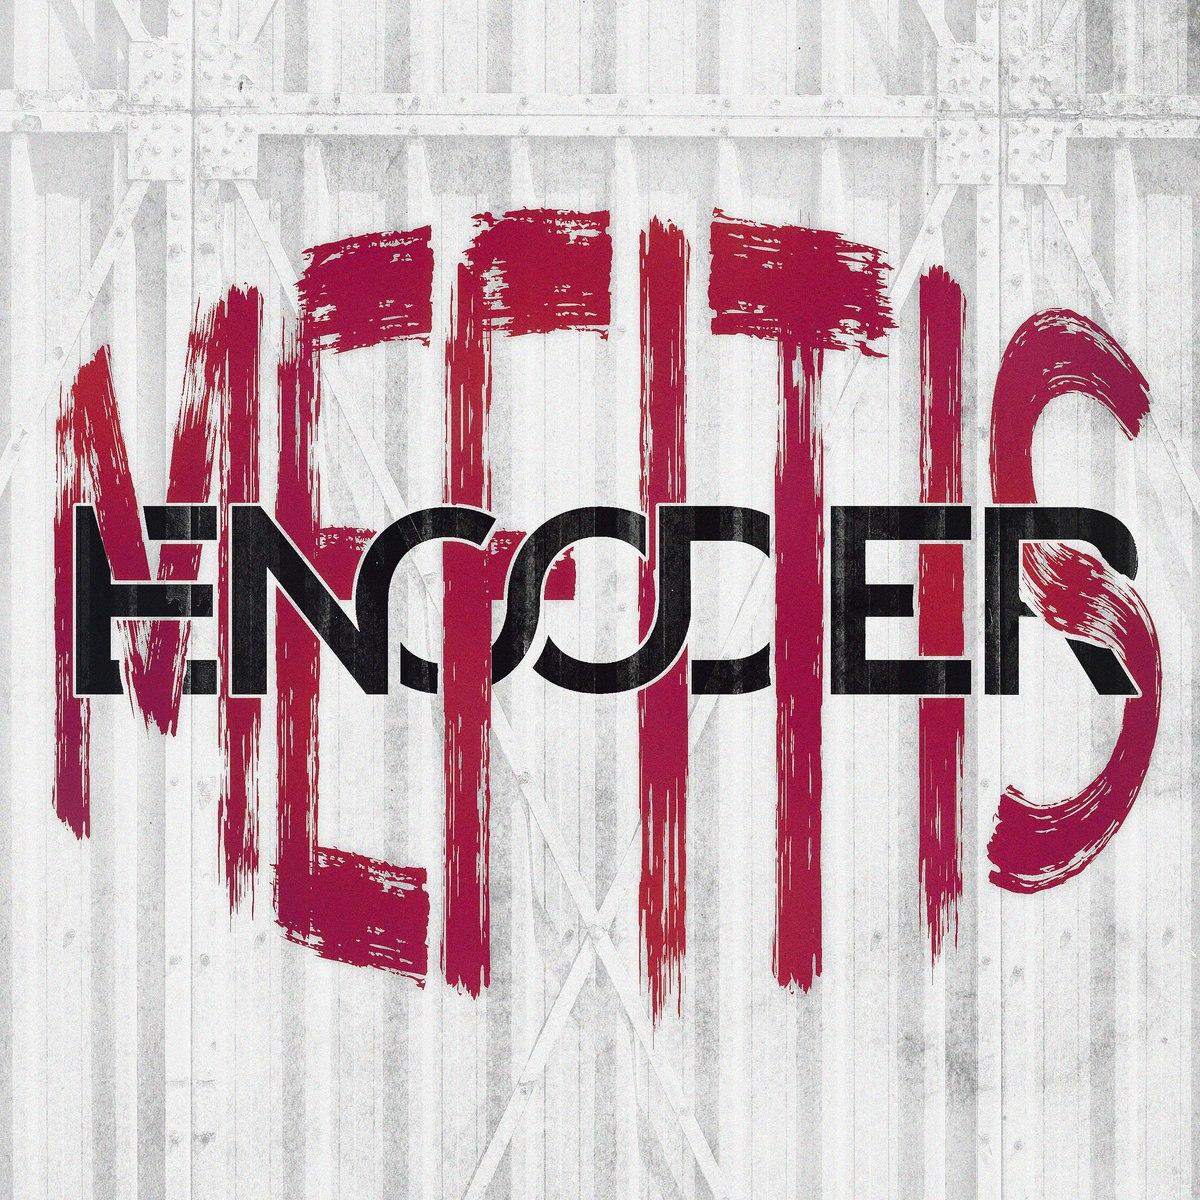 Encoder - Mefitis [single] (2017)